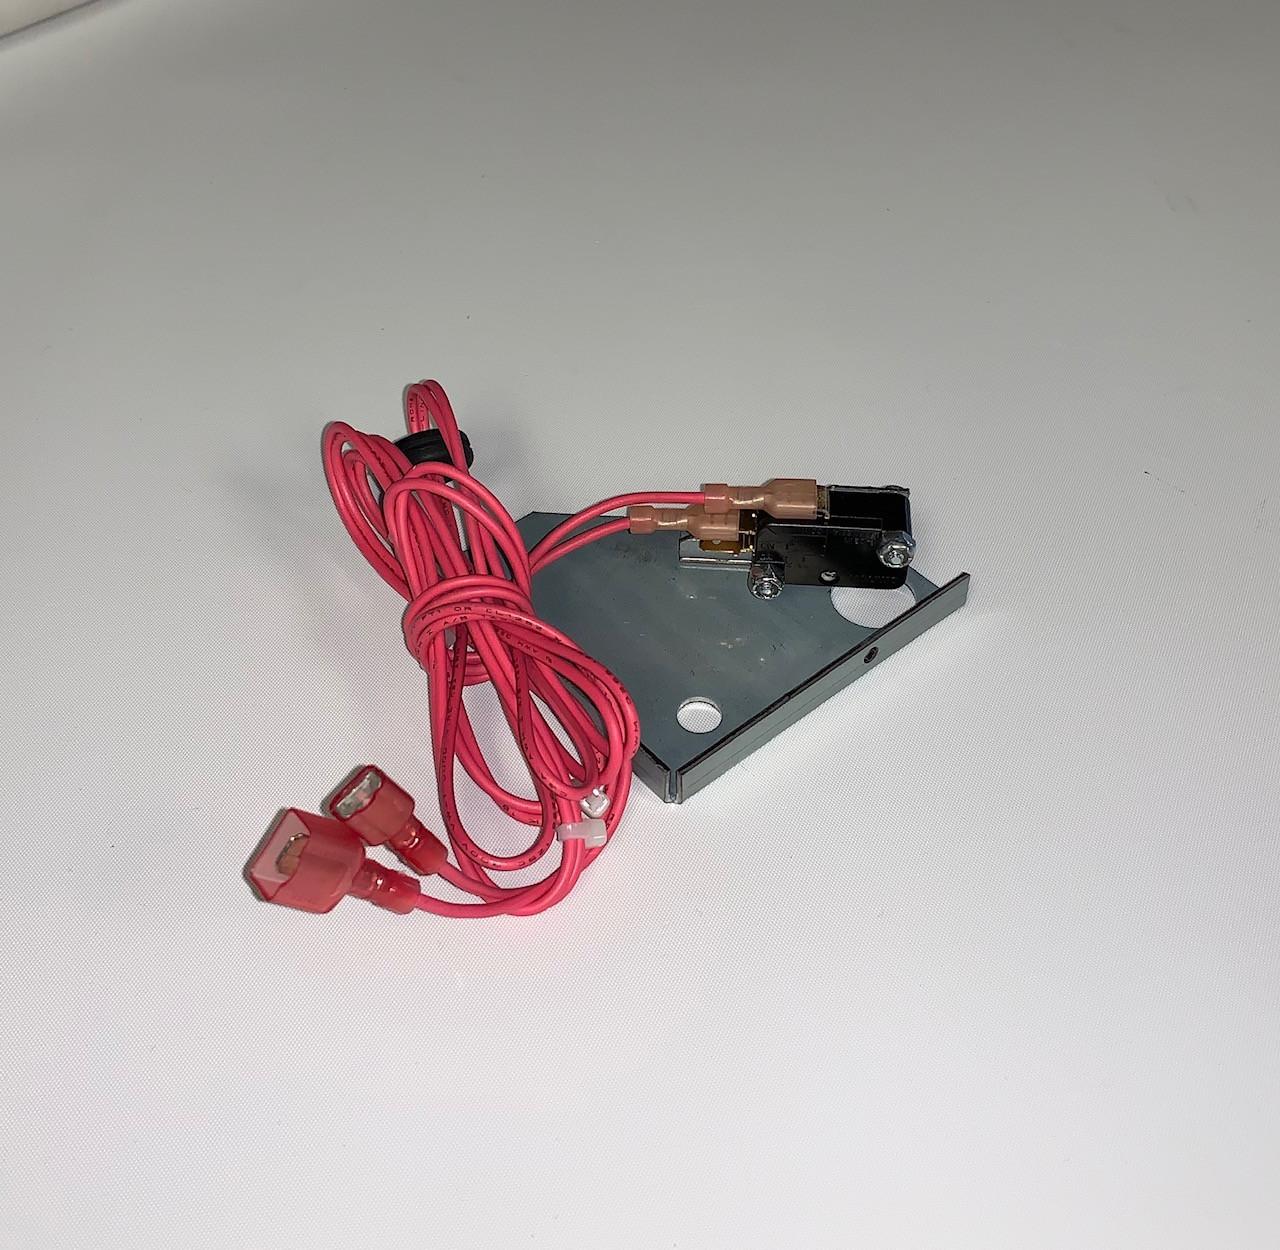 Arbor - Leyden Hopper lid switch 250-02146